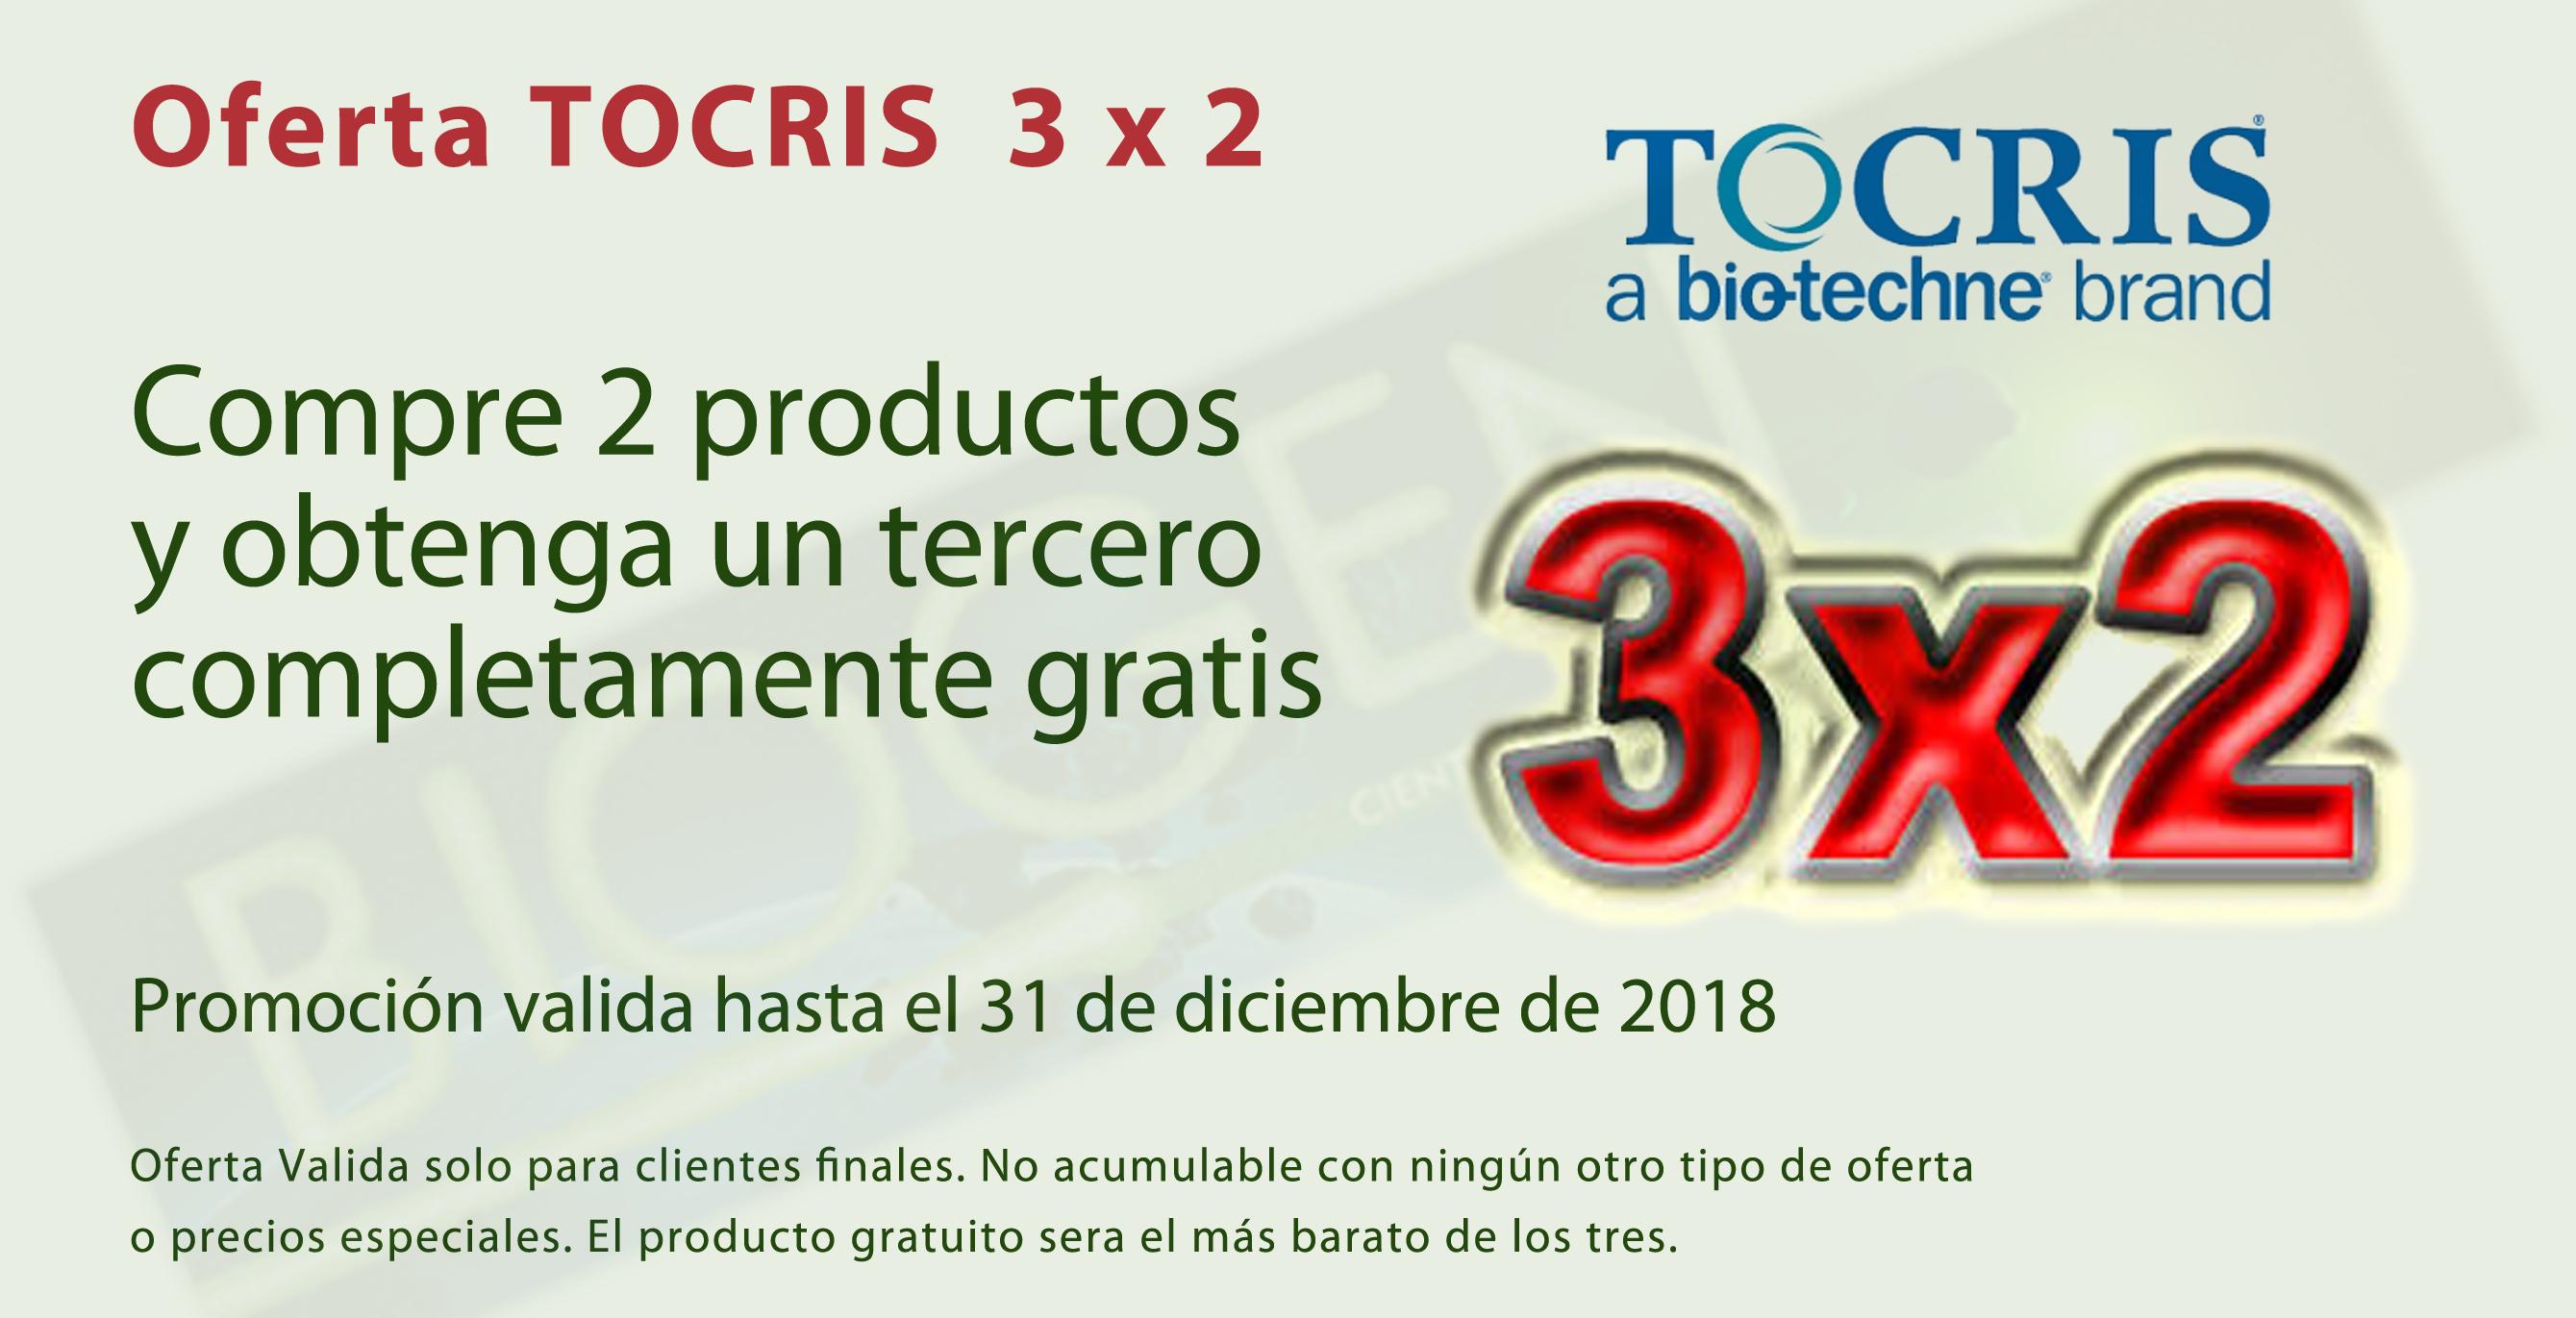 Oferta Tocris 3x2